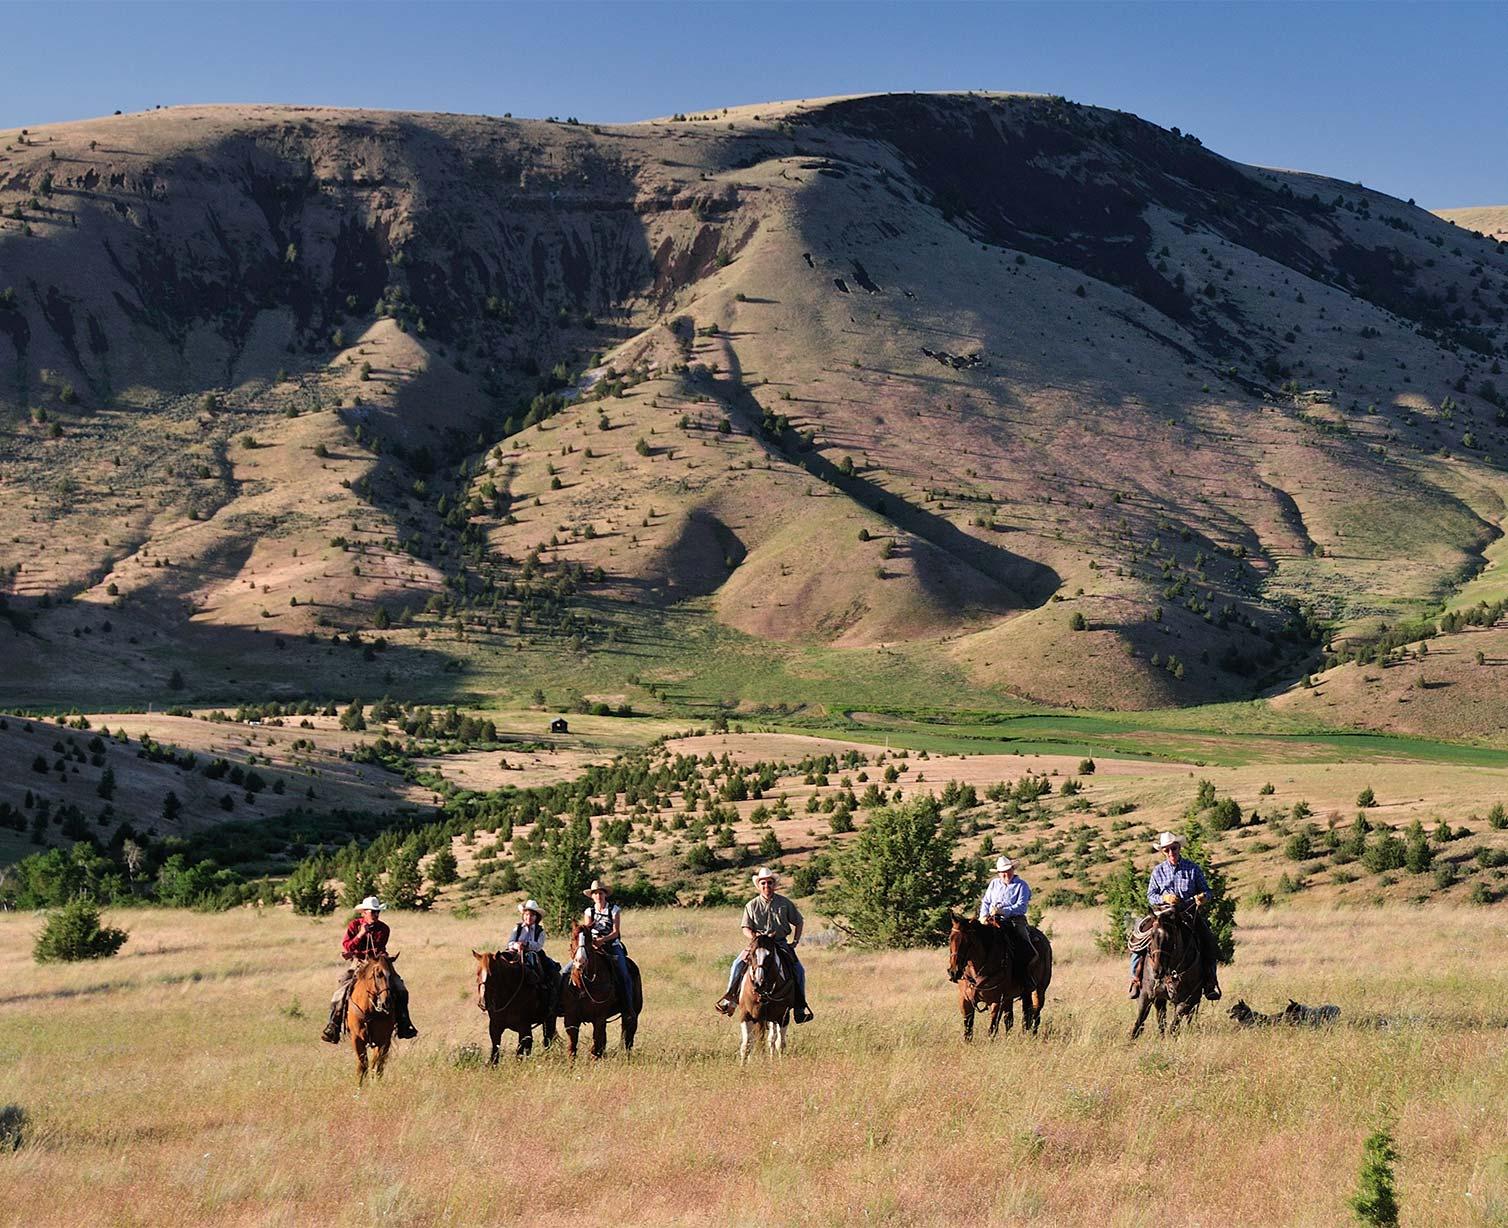 Group on horseback in front of scenic eastern oregon